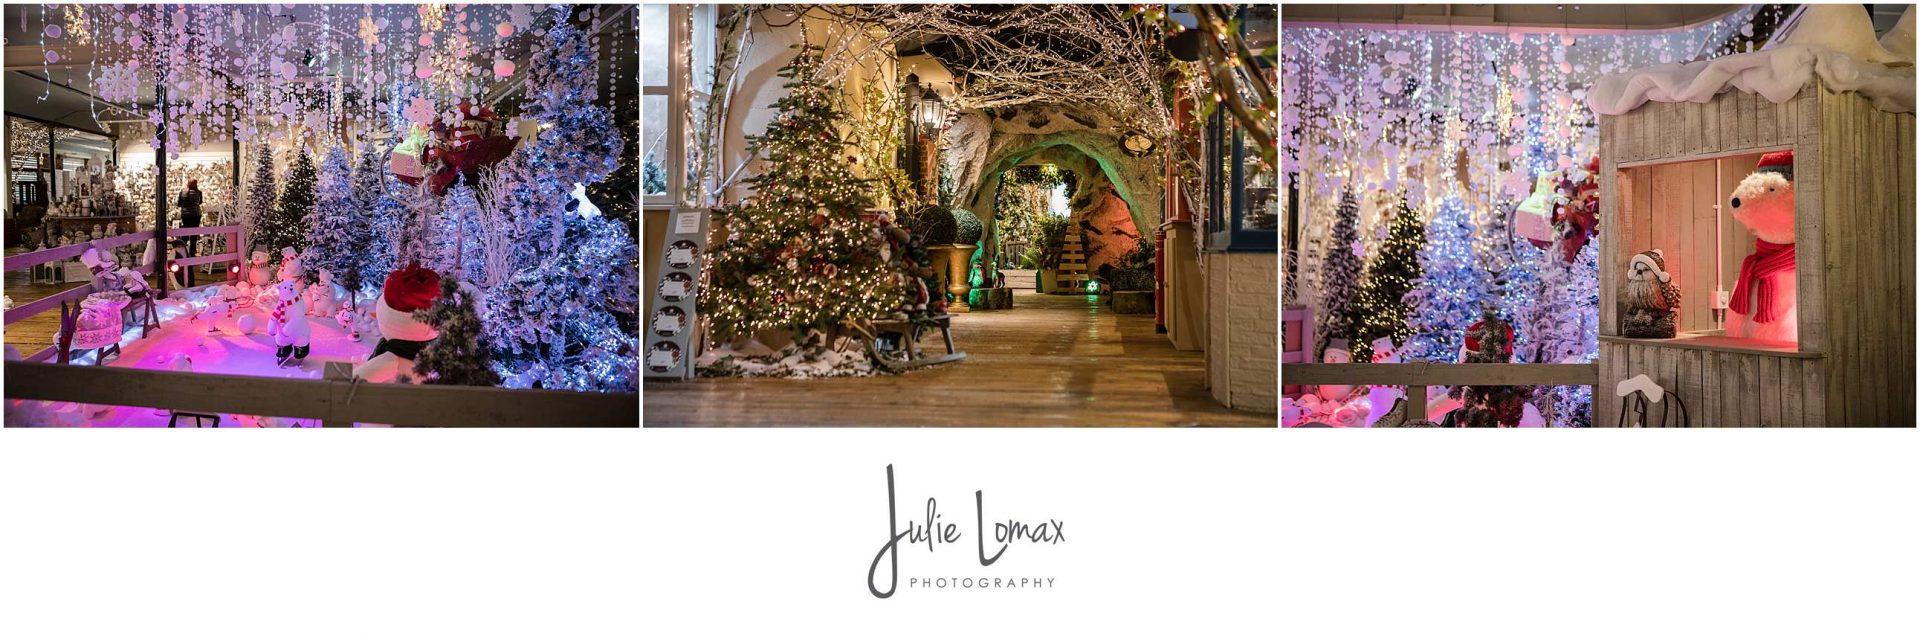 Documentary Photographer, Botany Bay, Christmas Shop, Chorley Photographer